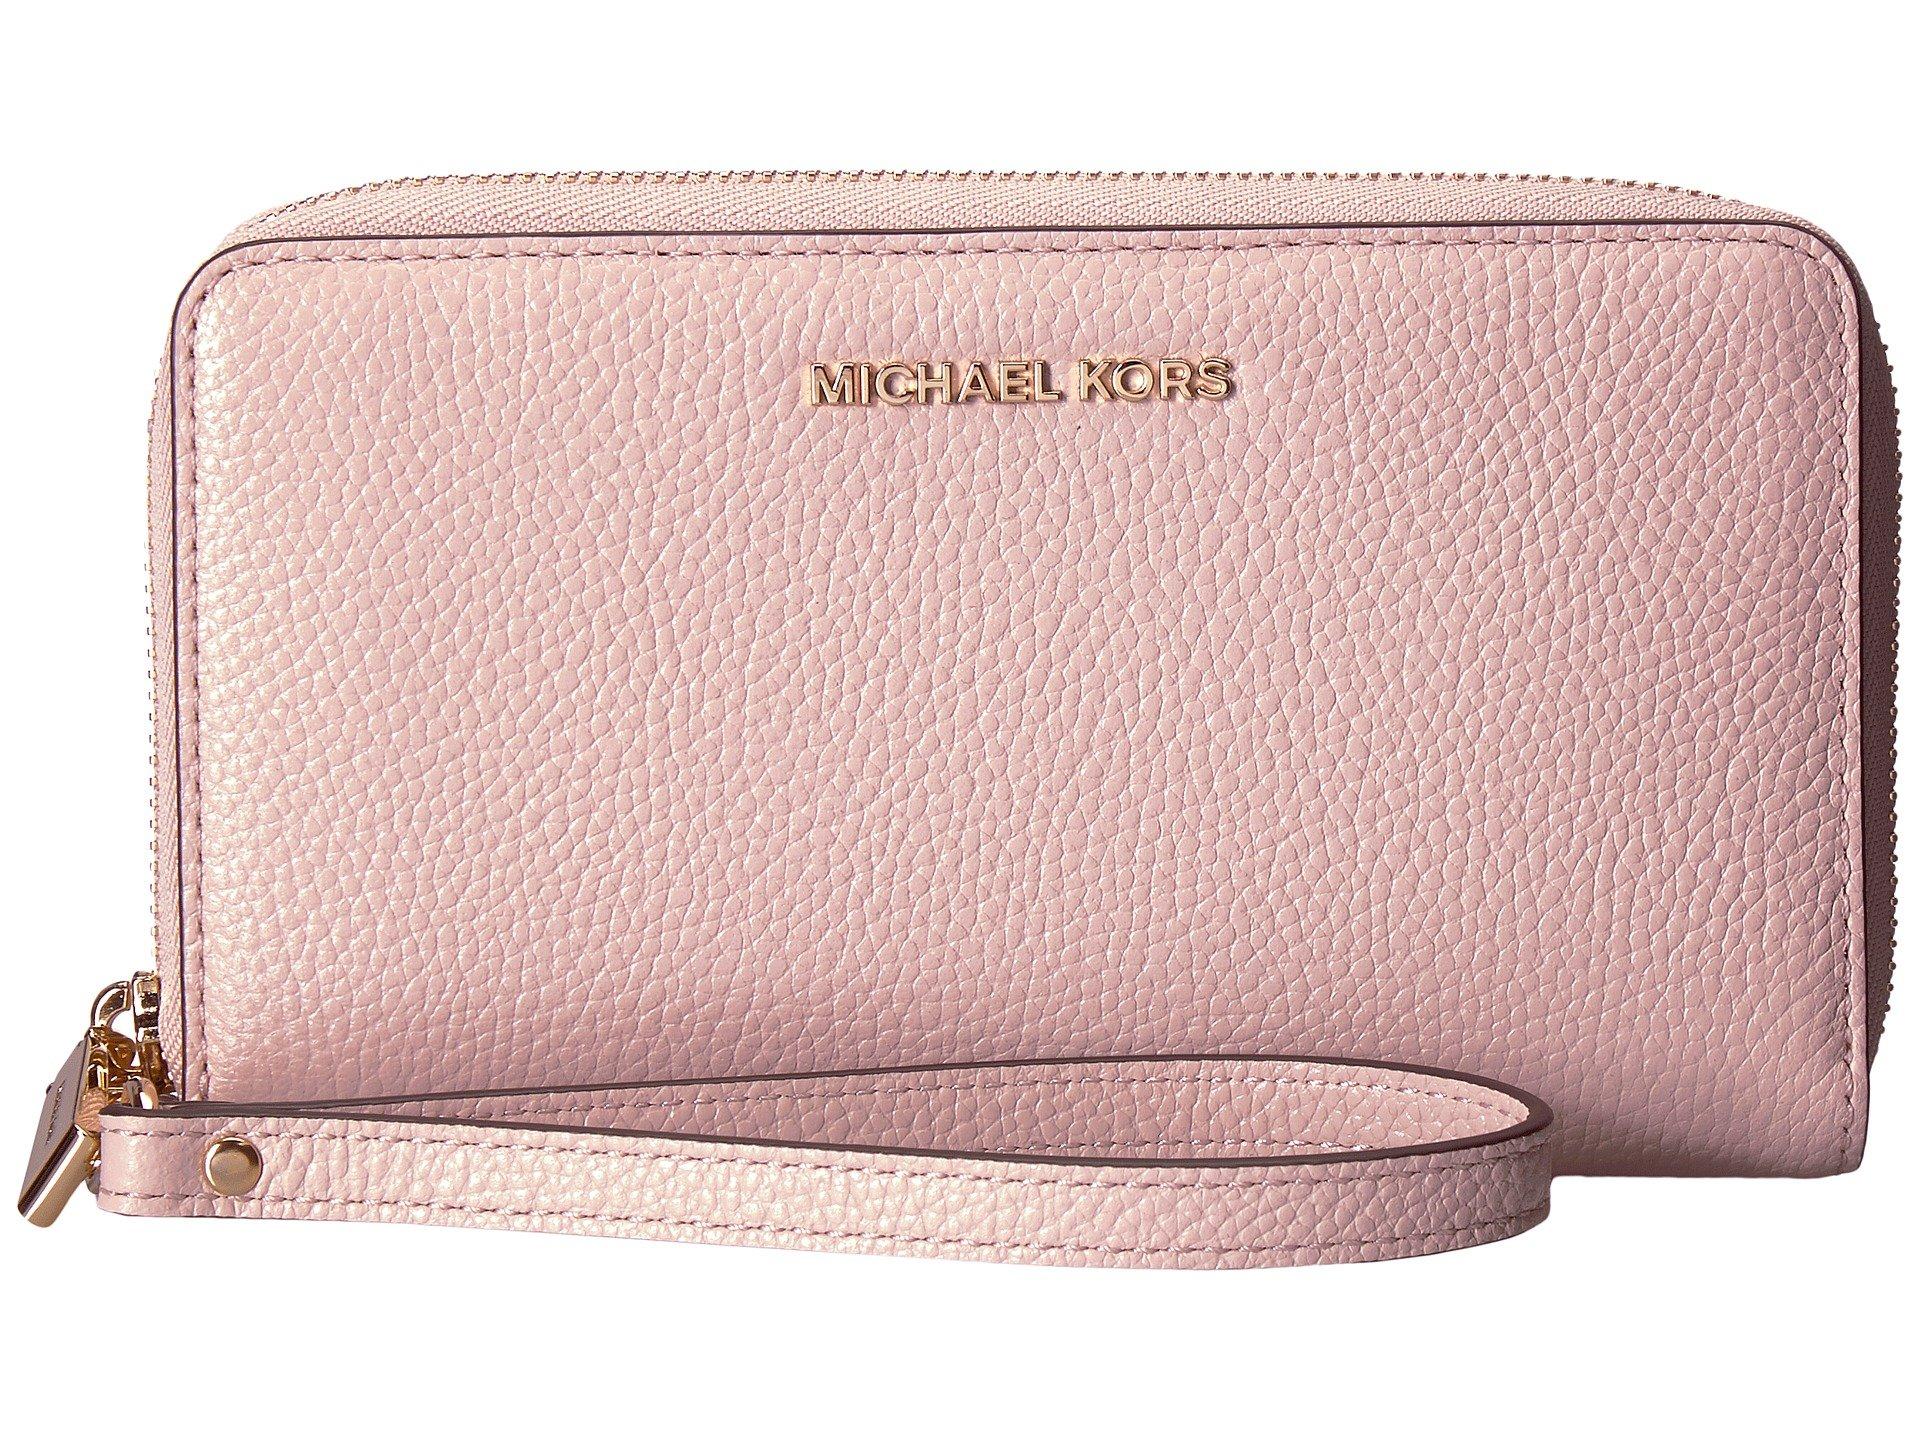 MICHAEL Michael Kors Women's Large Flat Phone Wristlet, Soft Pink, One Size by Michael Michael Kors